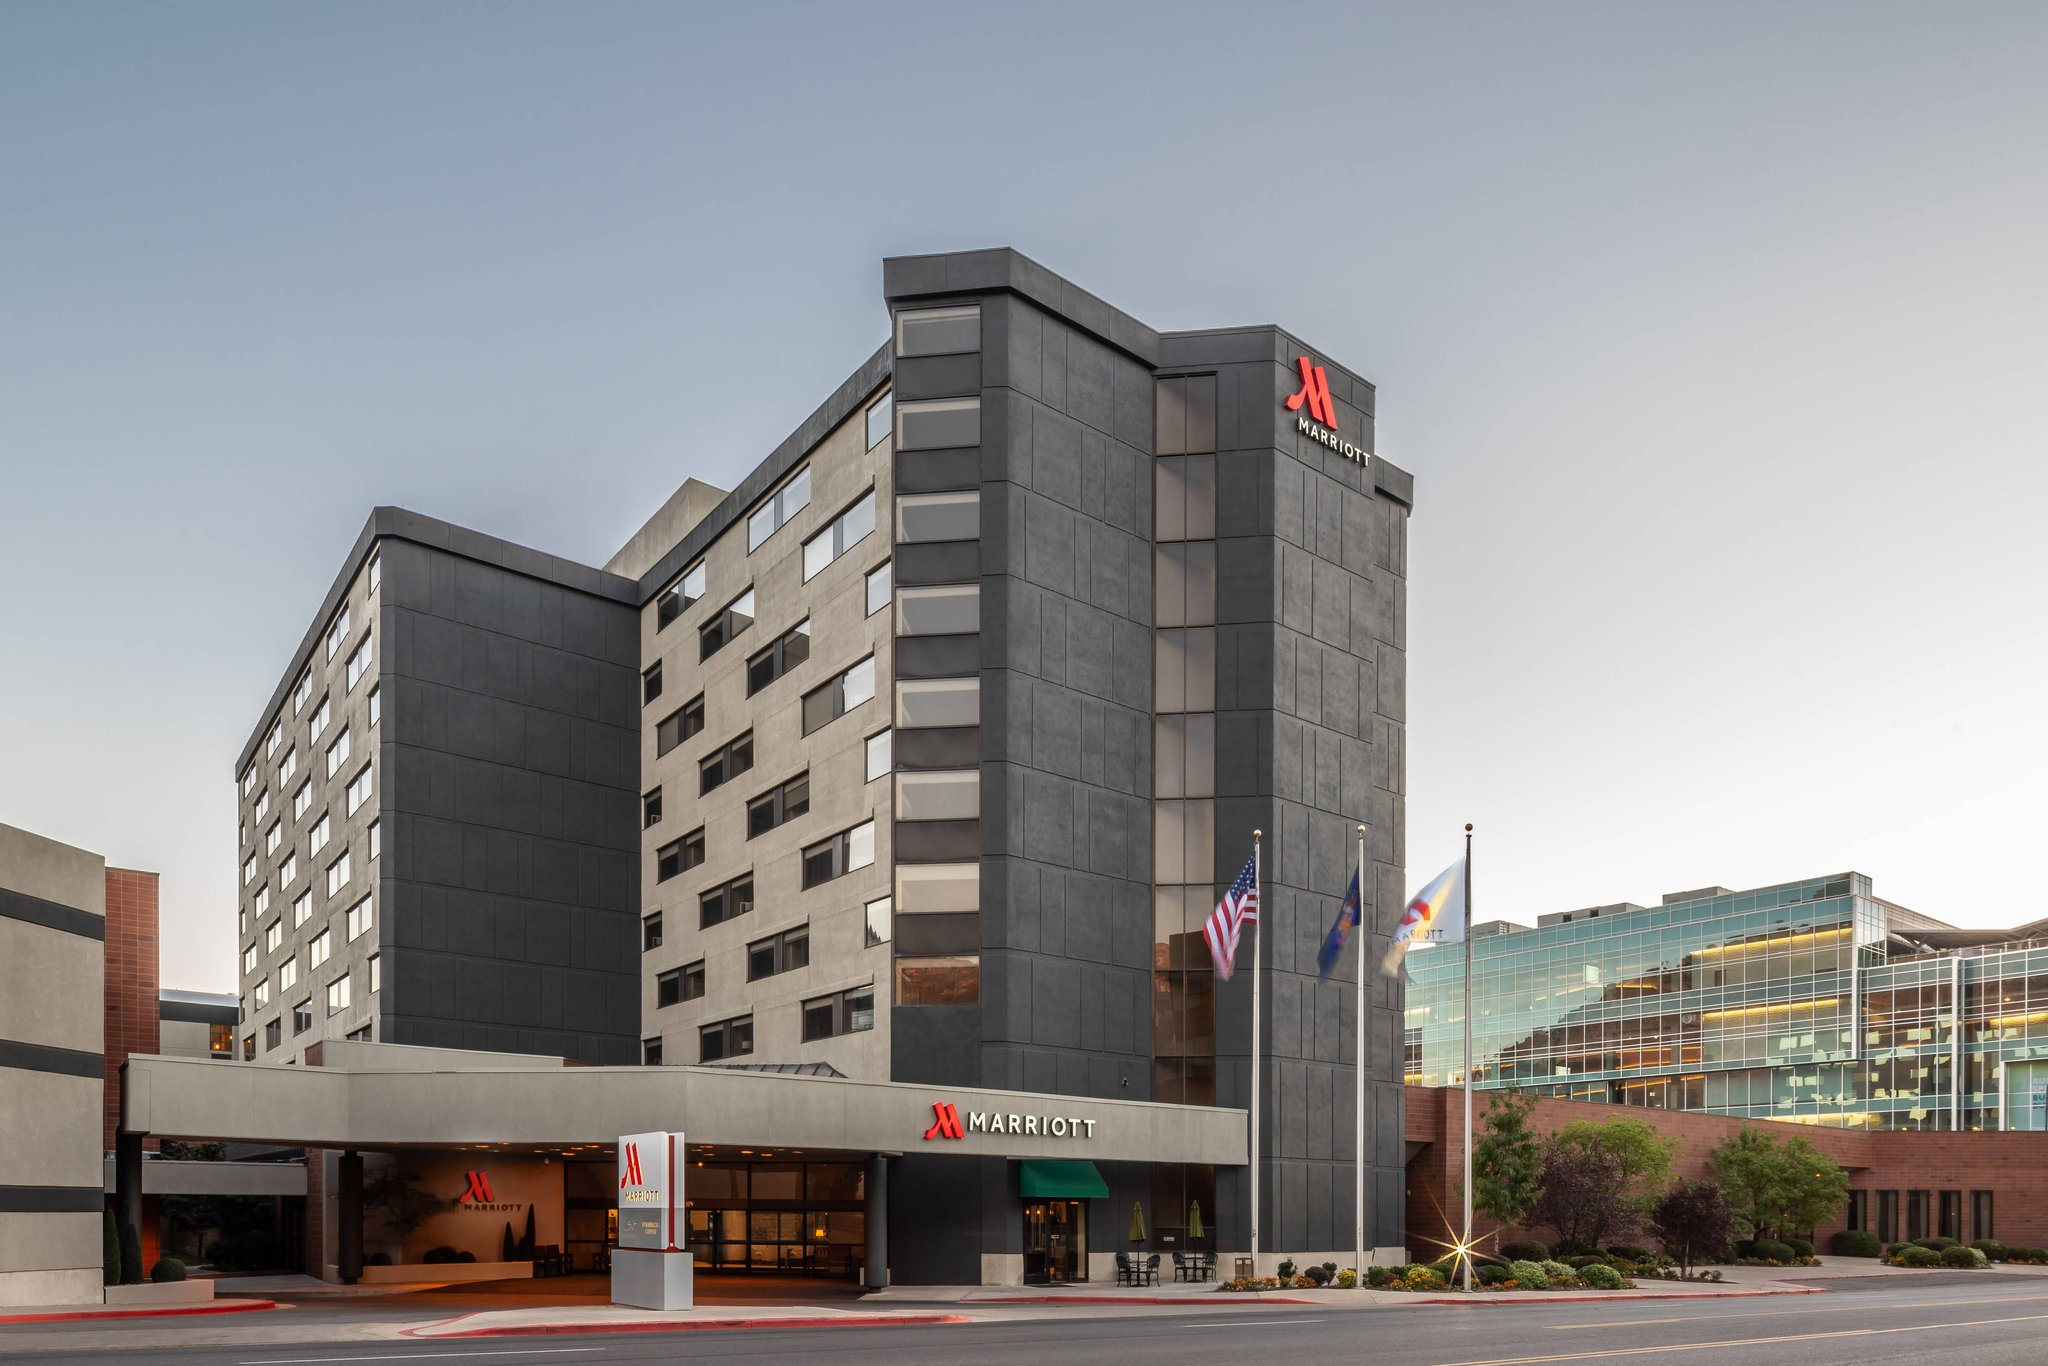 provo marriott hotel conference center provo ut hotels. Black Bedroom Furniture Sets. Home Design Ideas